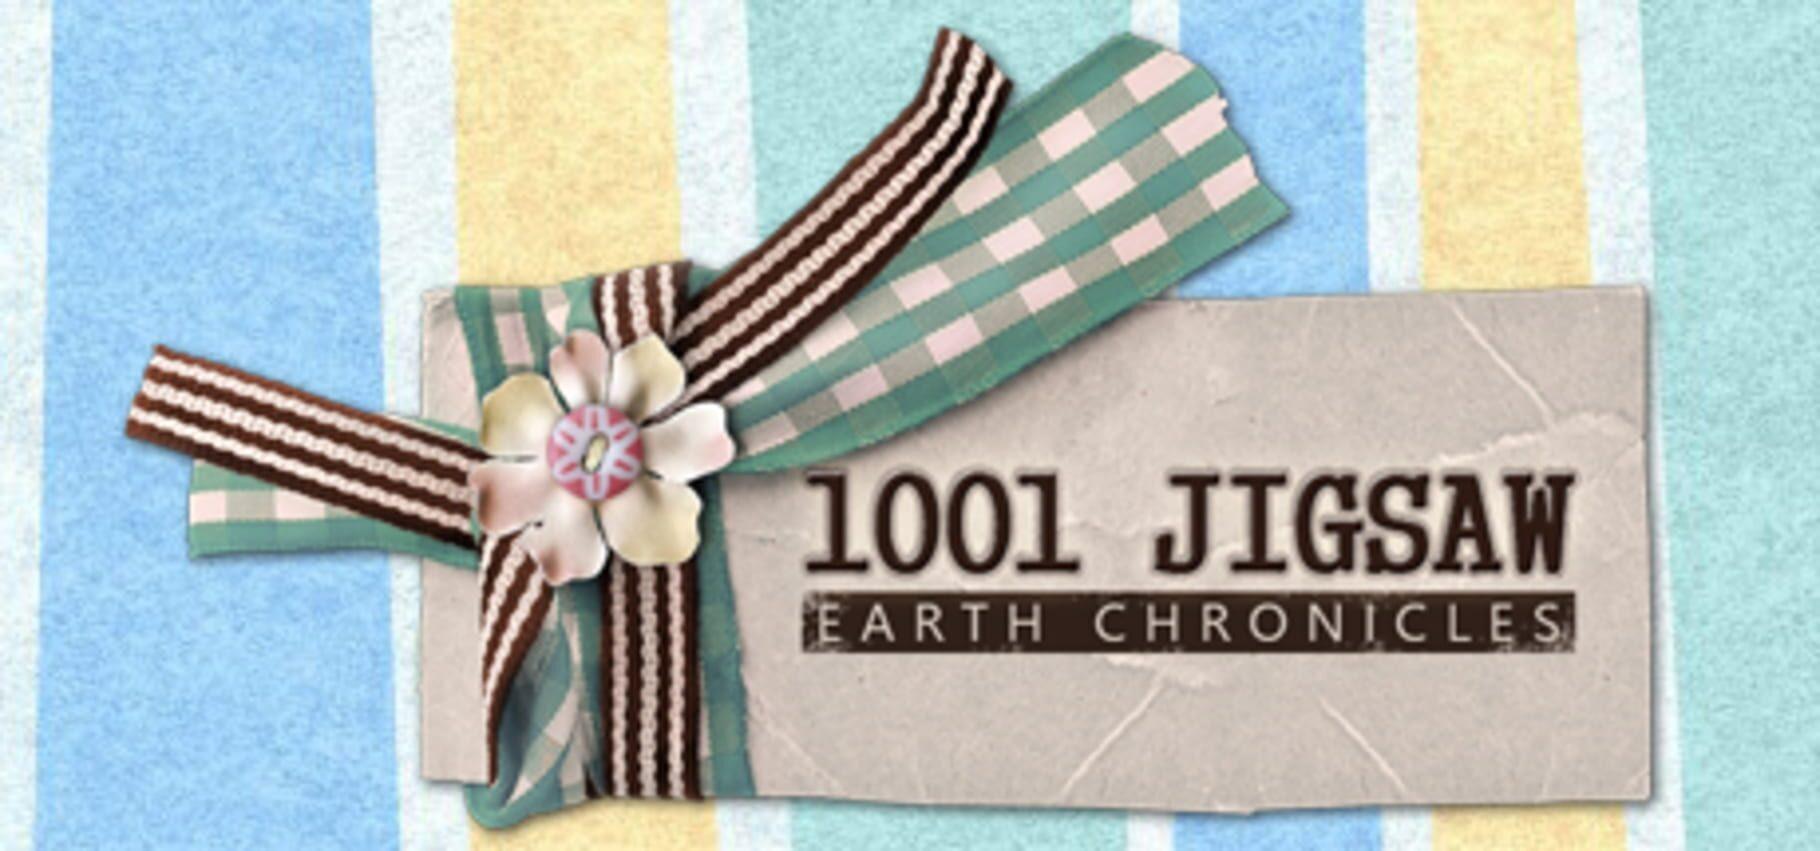 buy 1001 Jigsaw. Earth Chronicles cd key for all platform